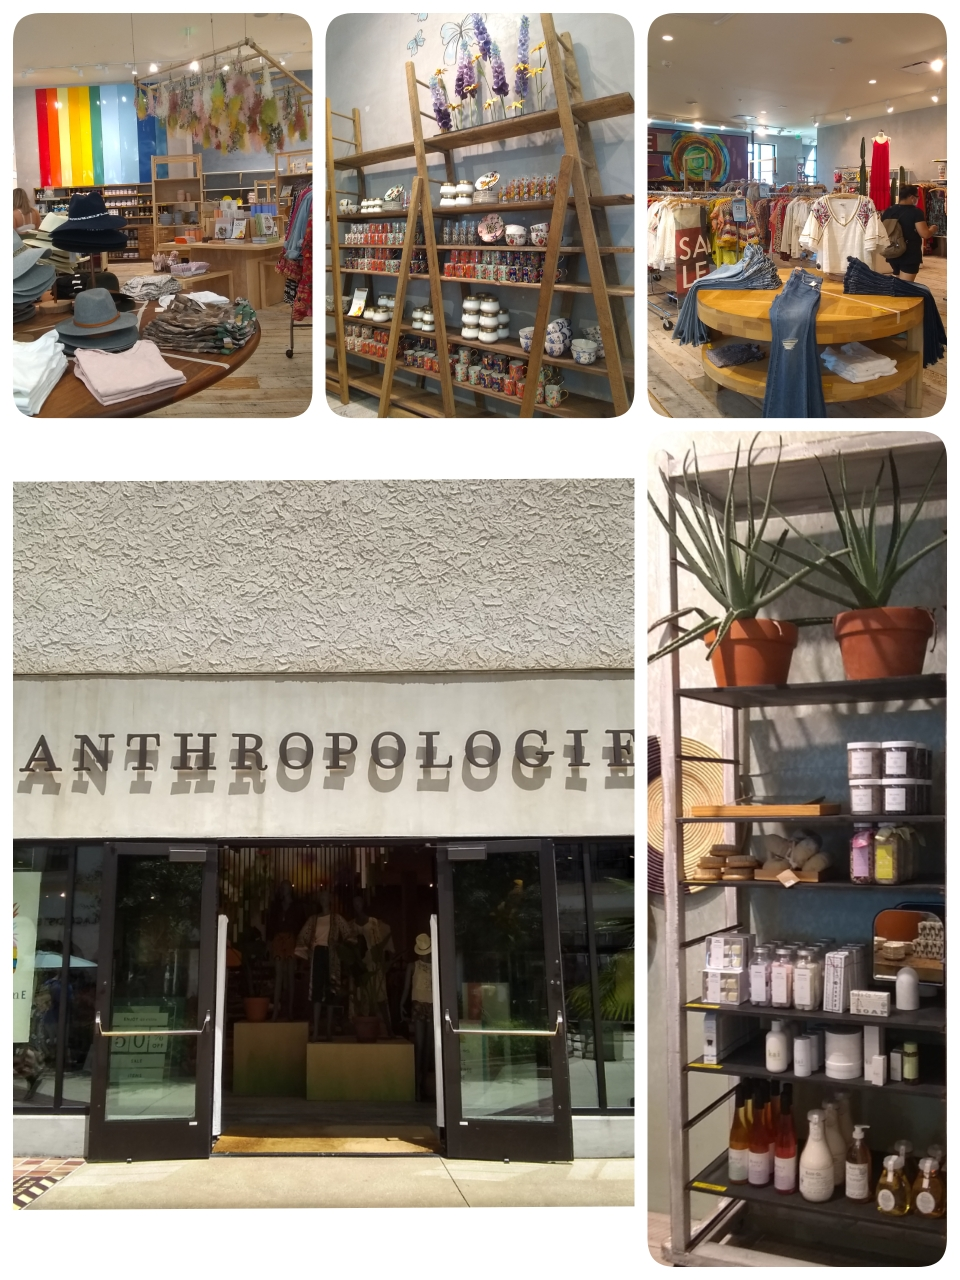 ANTHROPOLOGIE (オシャレな洋服と雑貨のお店)